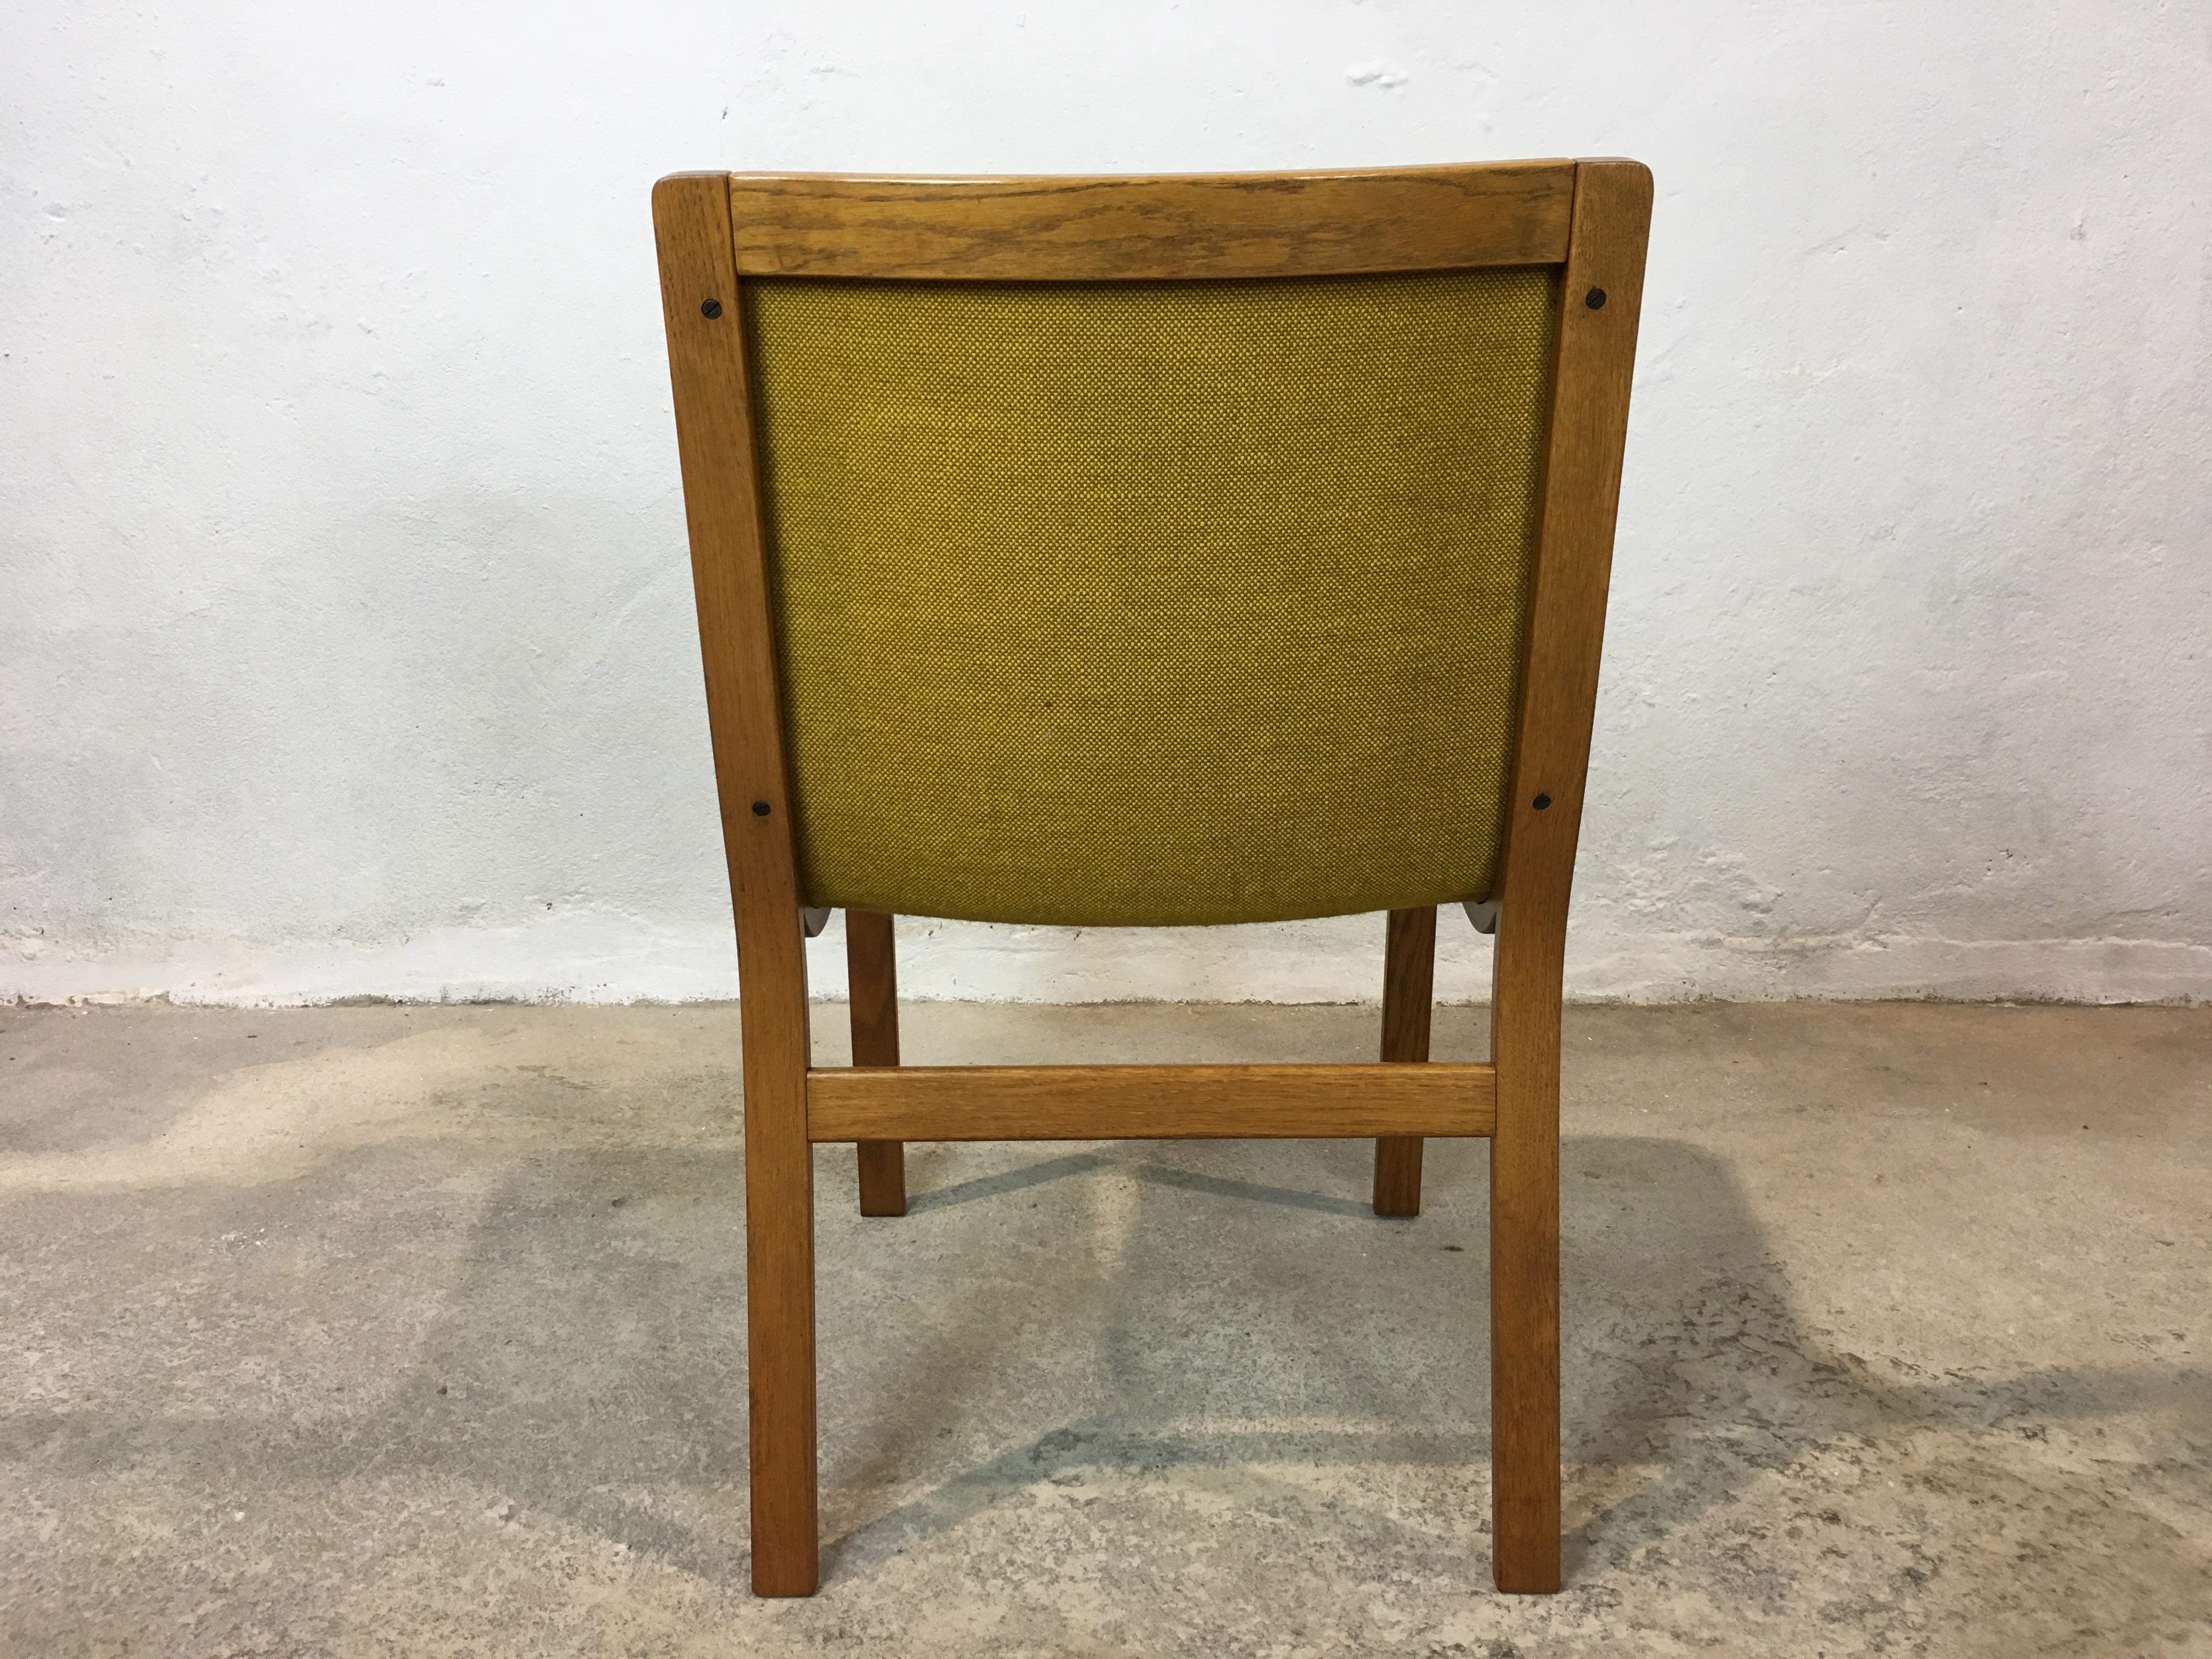 4 Chaises Scandinave Anne 70 Dining Chair Karl Erik